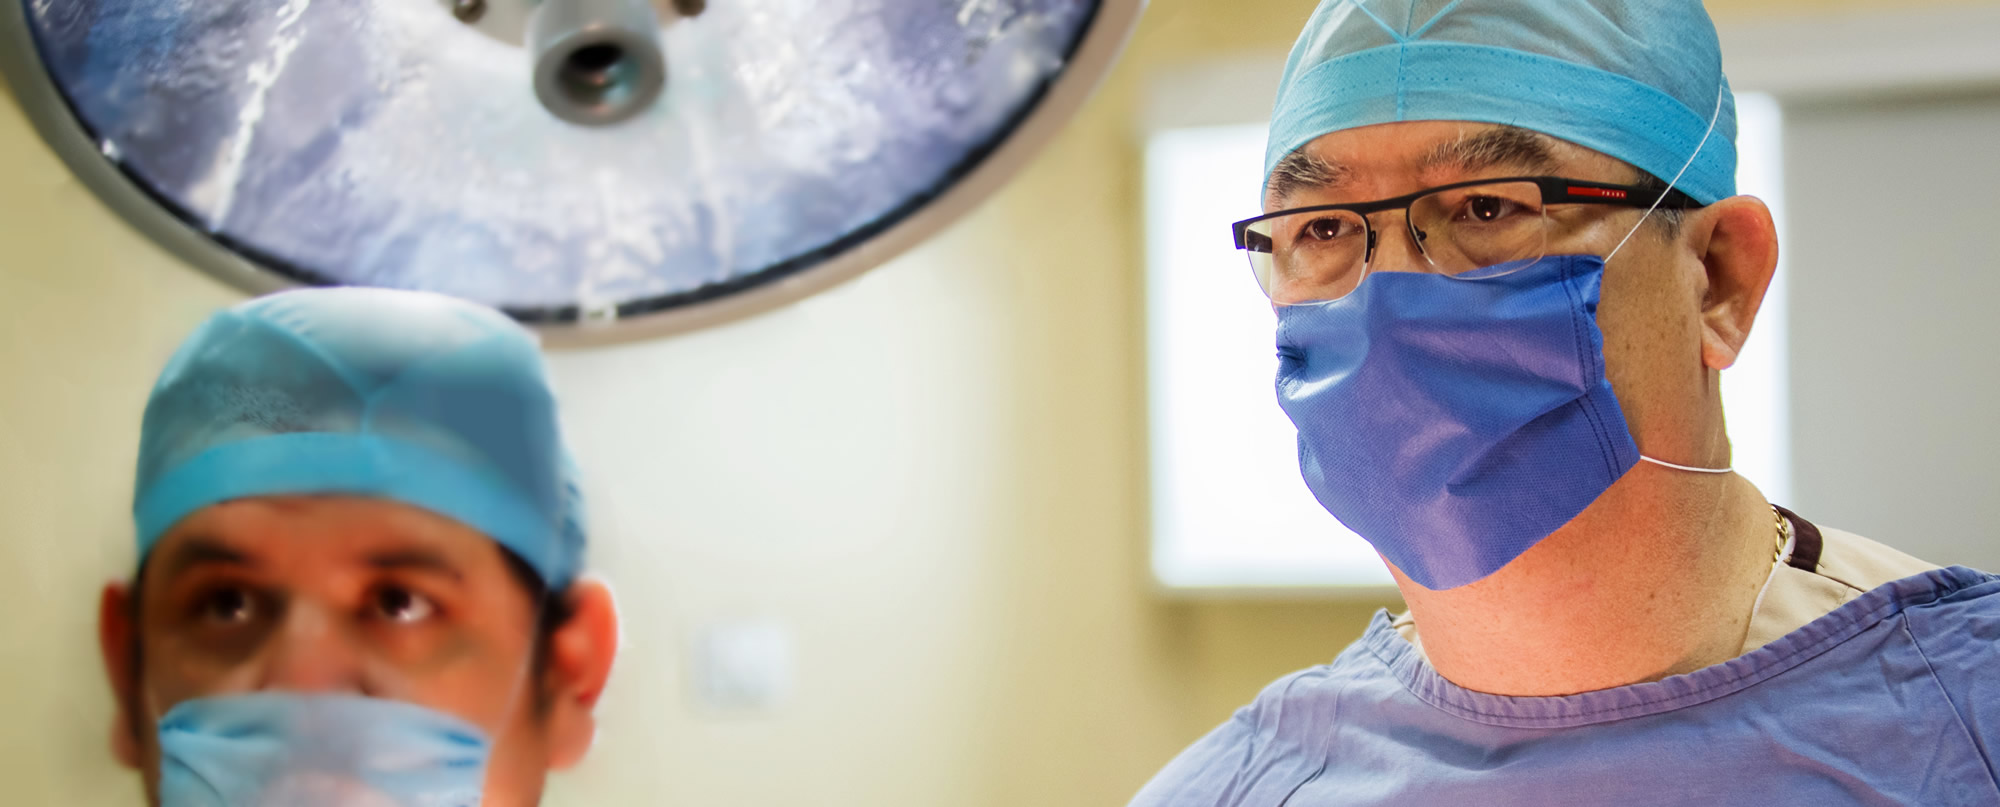 Bariatric Surgery Proctor Center